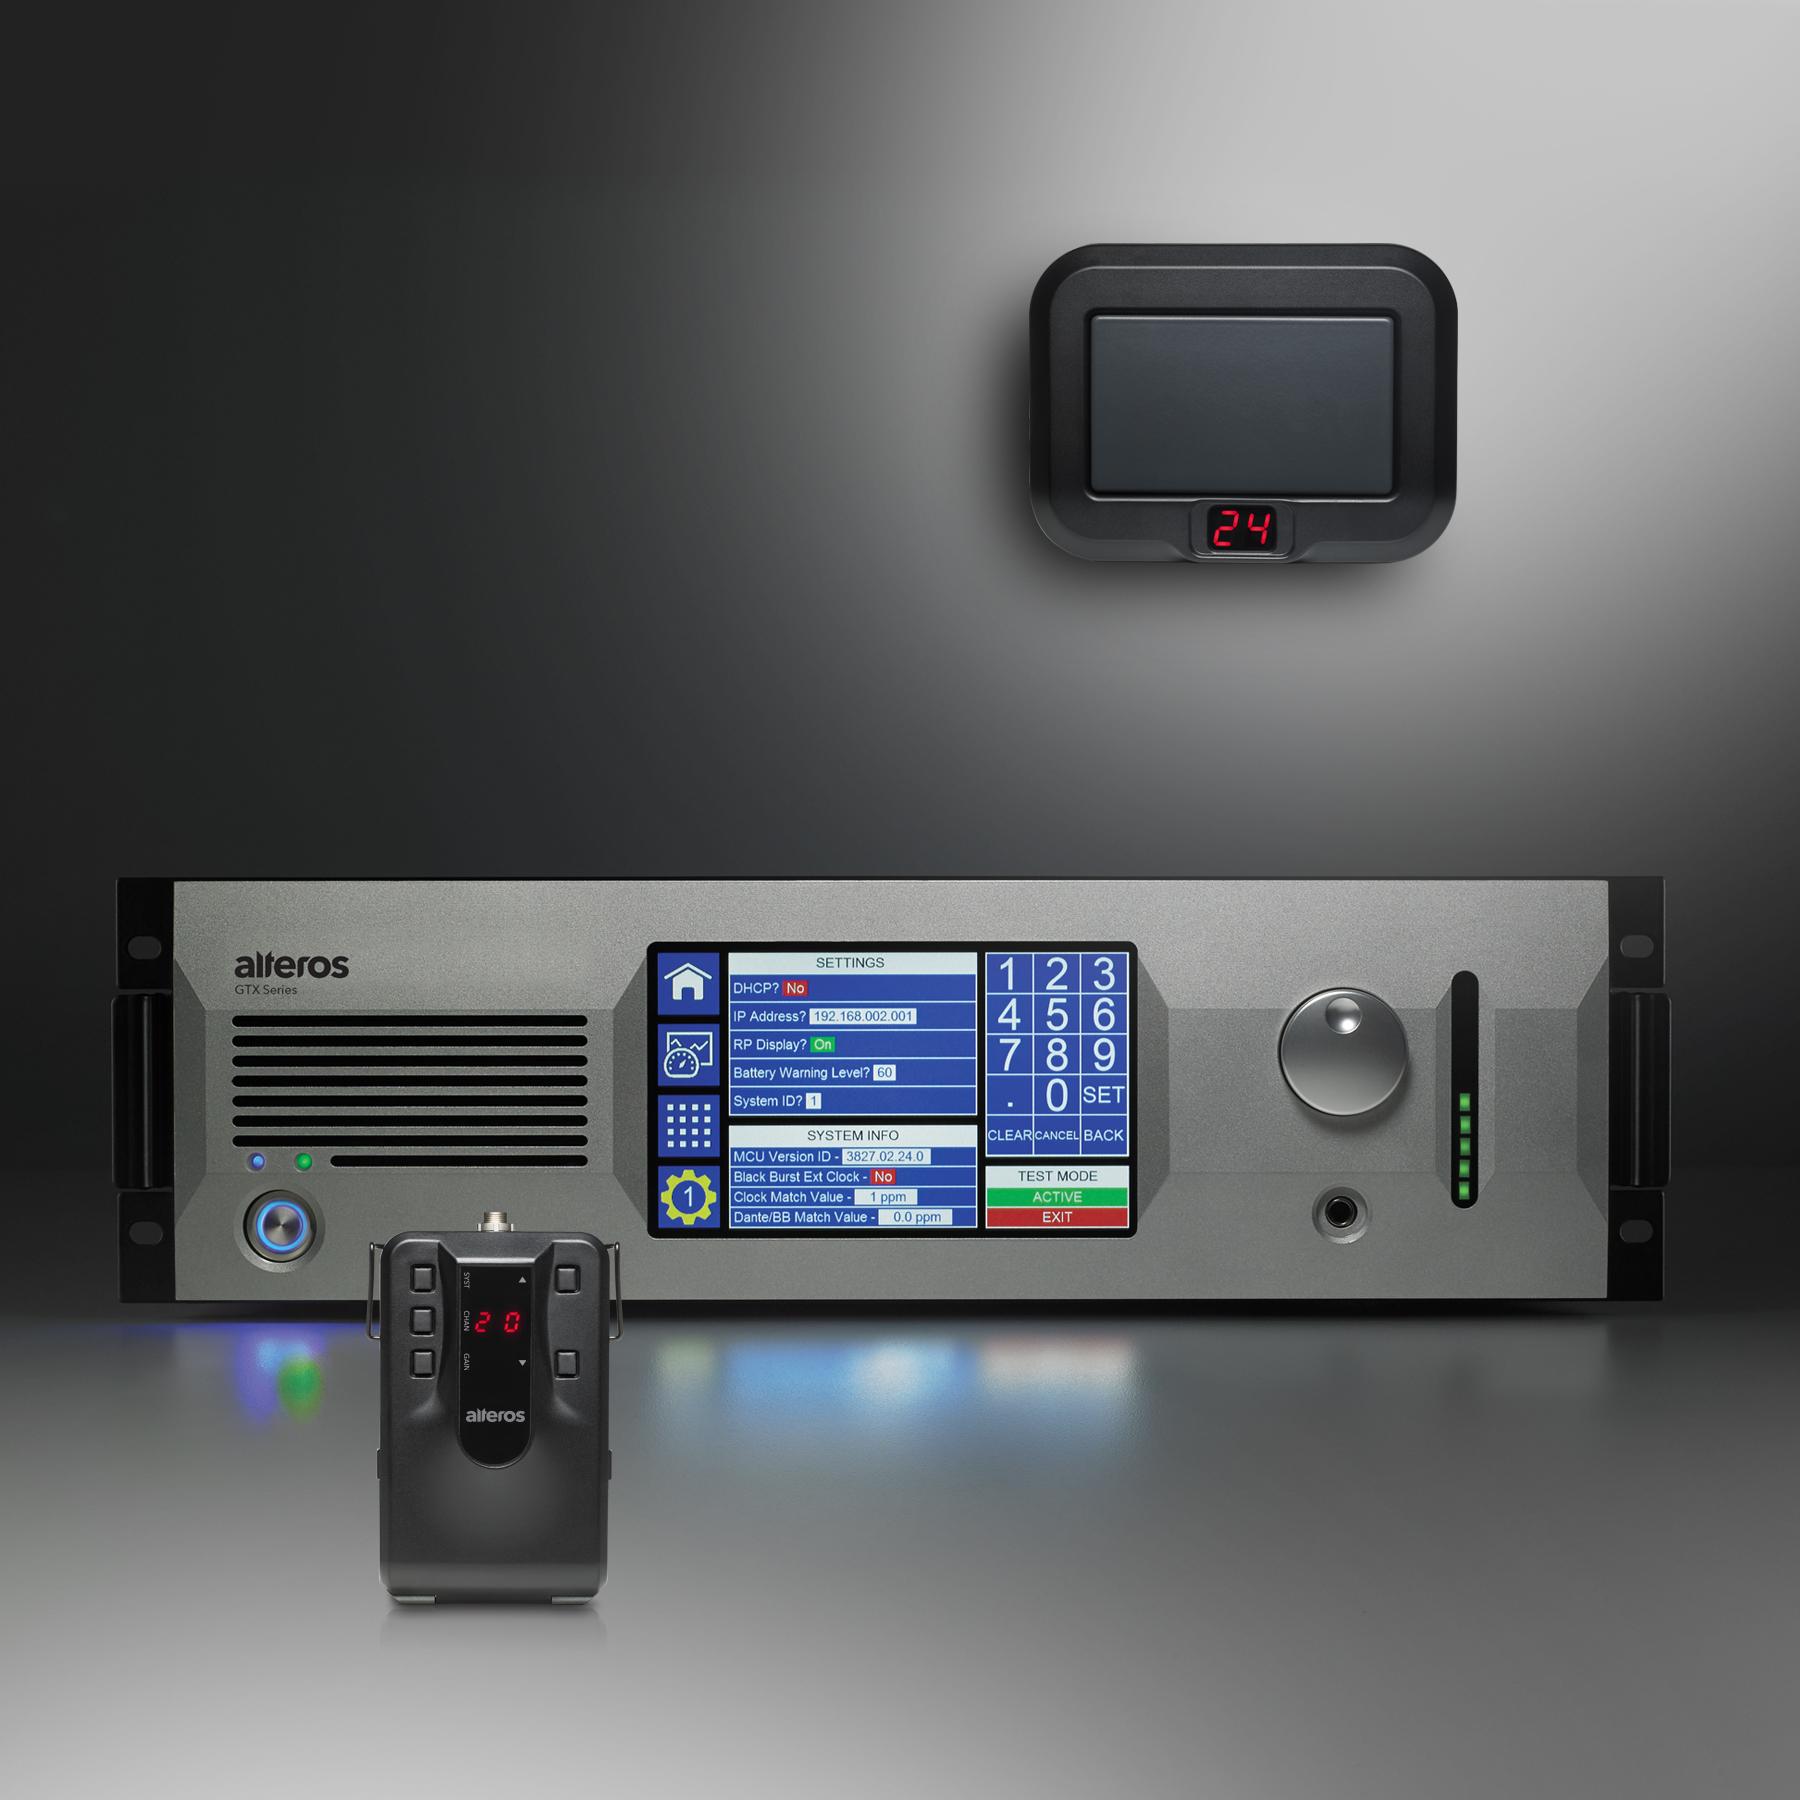 http://clynemedia.com/audiotechnica/Alteros_PRs/Alteros_GTX/Alteros_GTX_Series.jpg